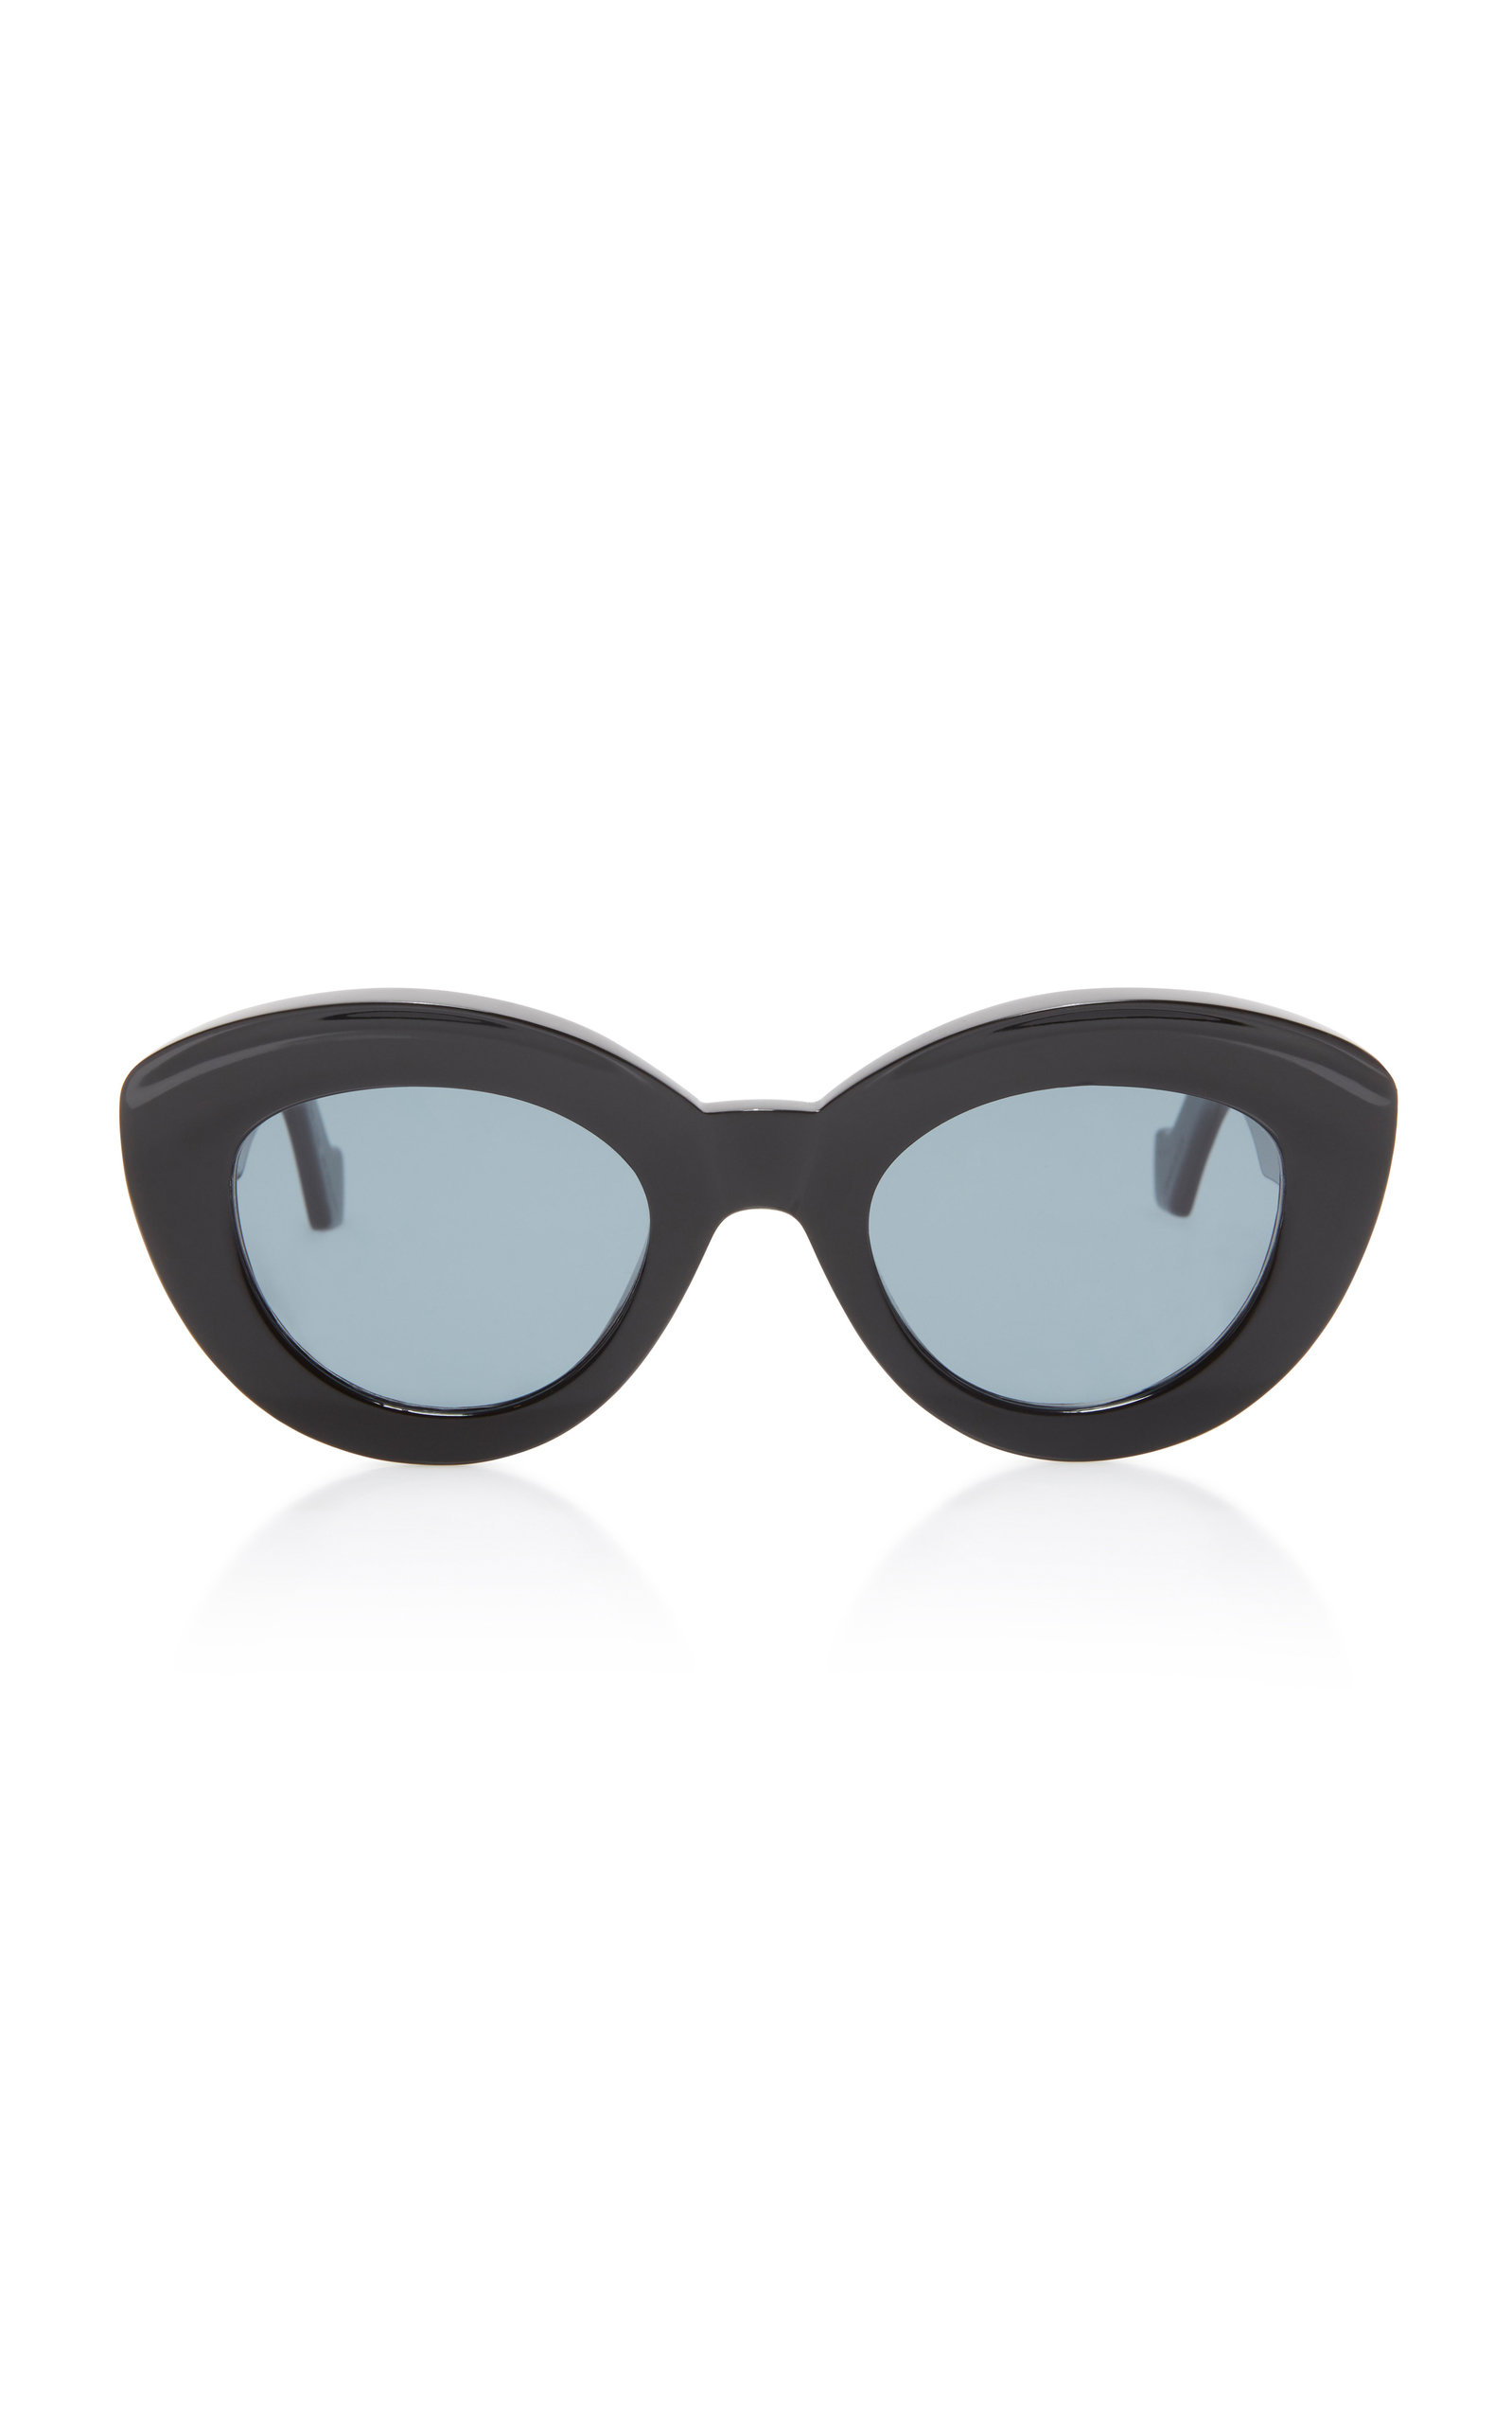 4a2571dd5e6 Cat-Eye Acetate Sunglasses by Loewe Sunglasses